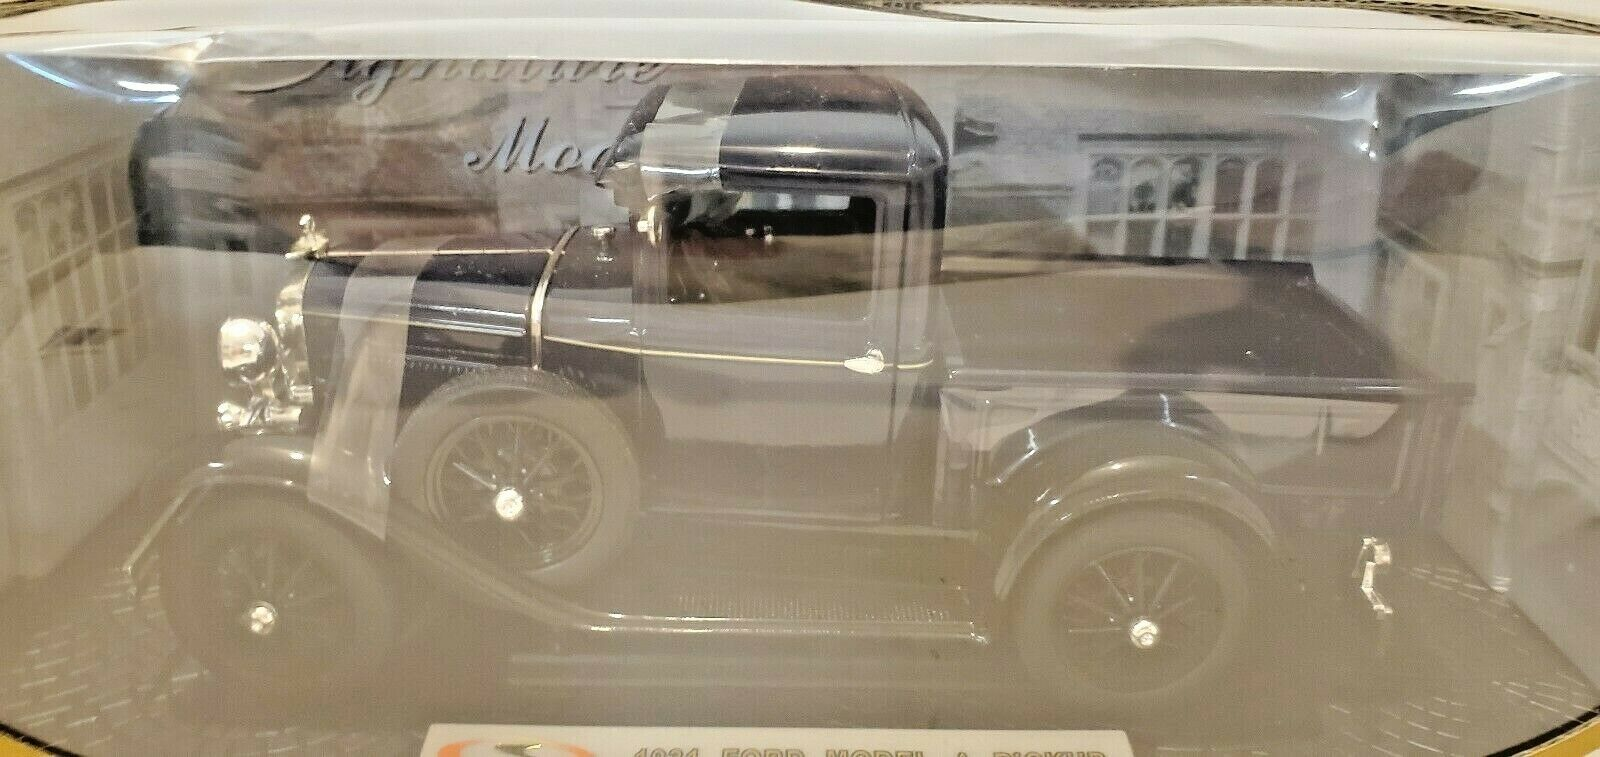 solo cómpralo Signature Signature Signature Models nuevo 1931 Ford modelo una camioneta de Color azul oscuro de 1 18 Modelo 18113  ahorra hasta un 50%